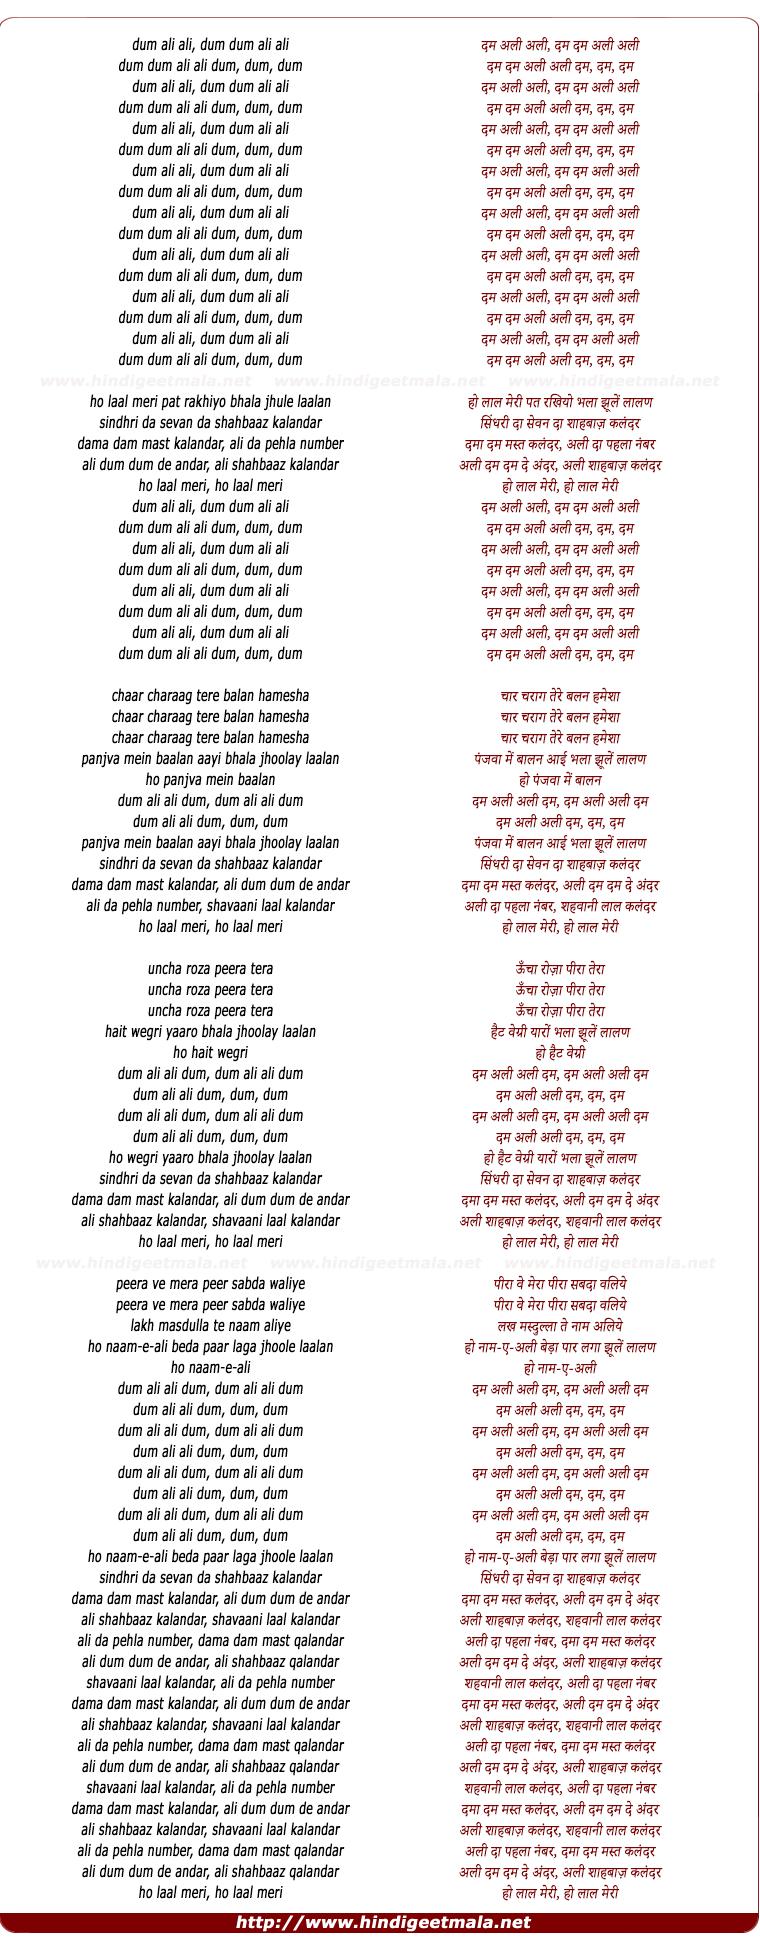 lyrics of song Dum Ali Ali Dum